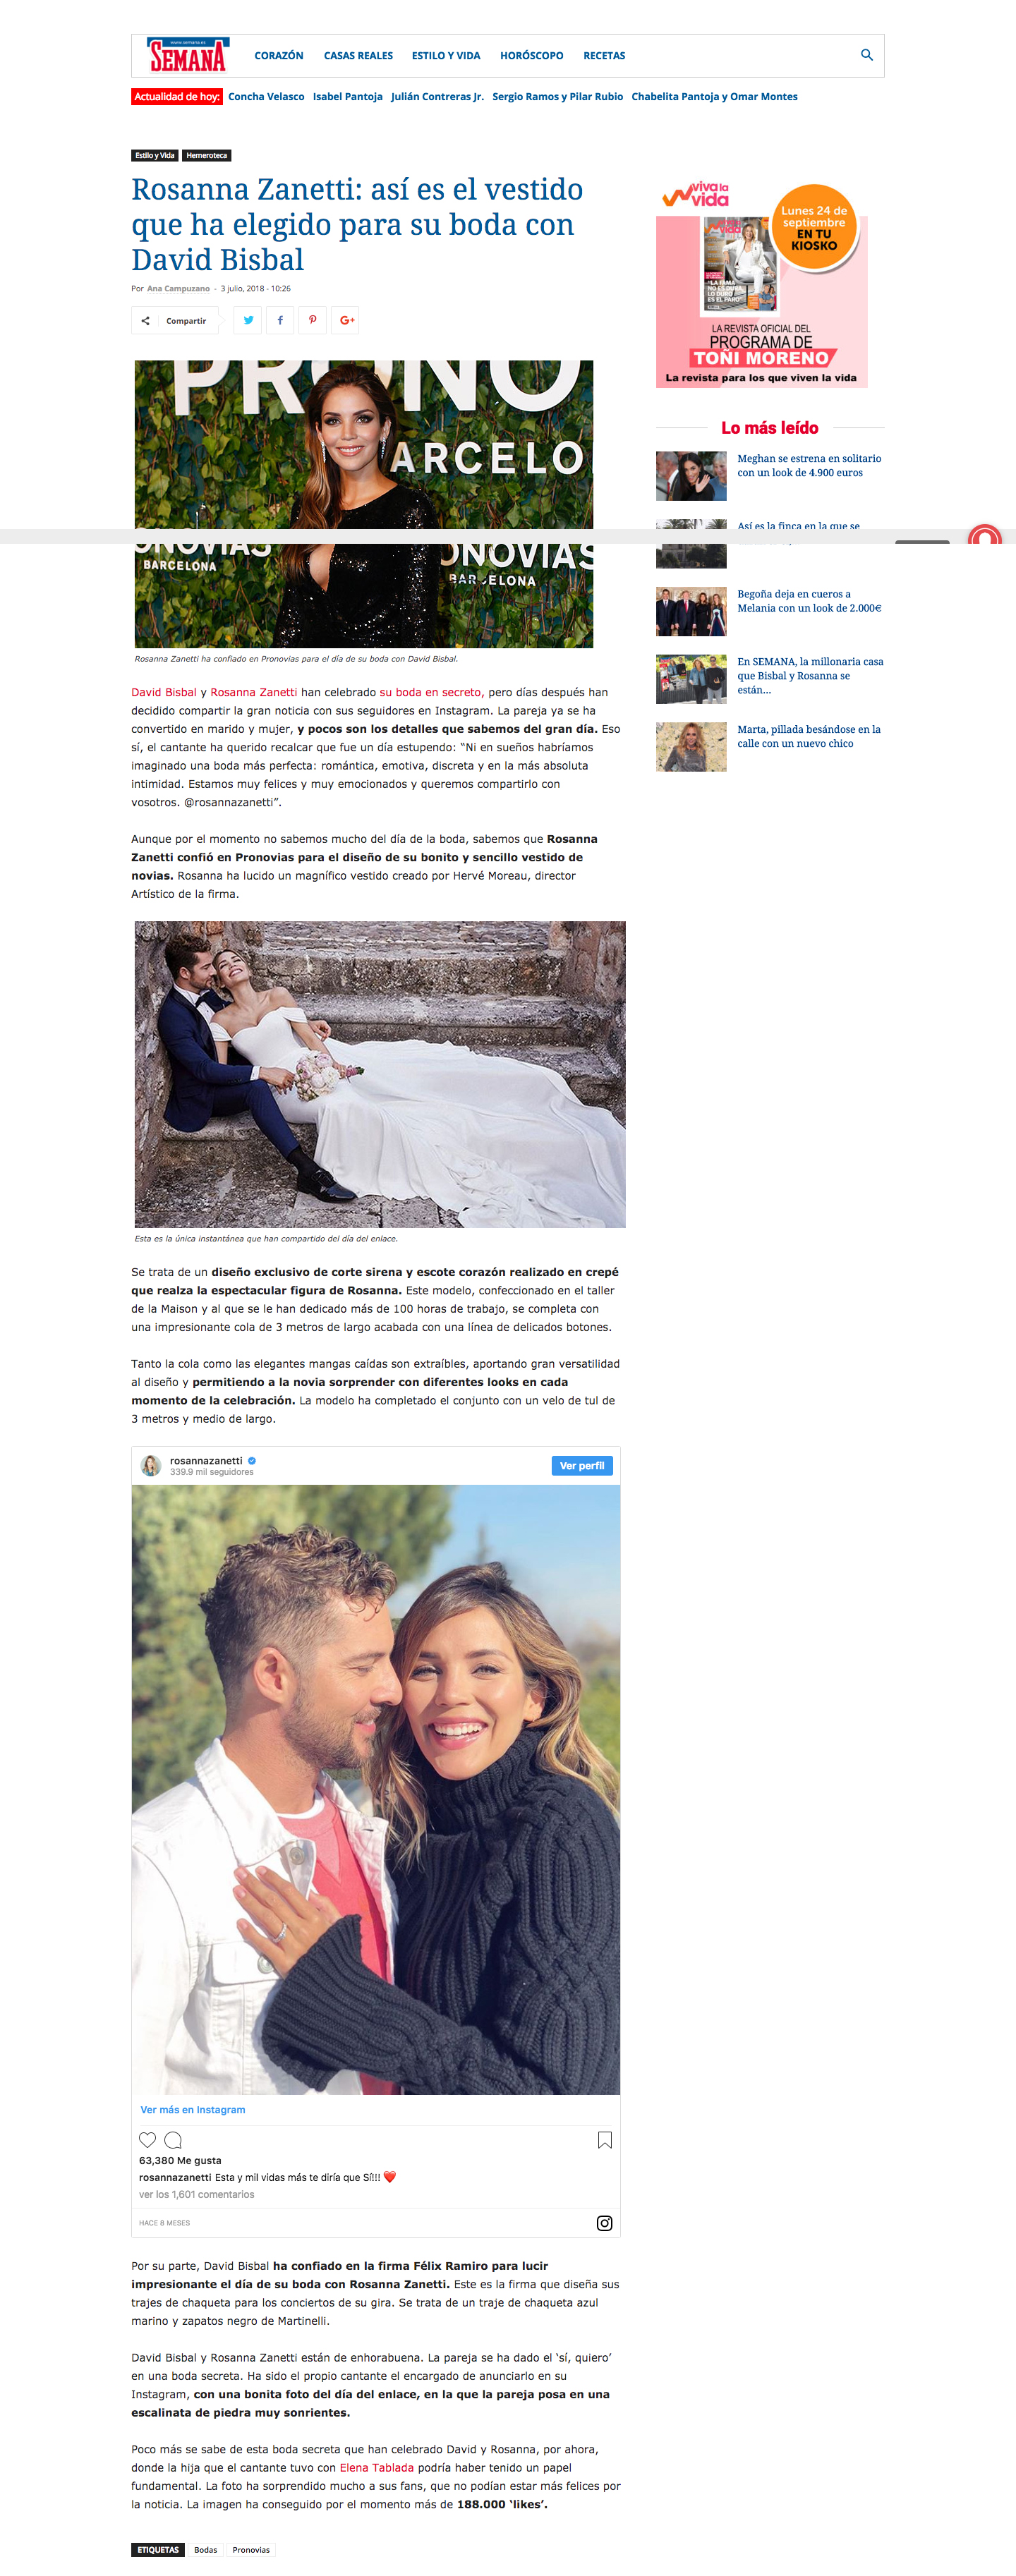 Artículo Prensa Semana boda David Bisbal Félix Ramiro